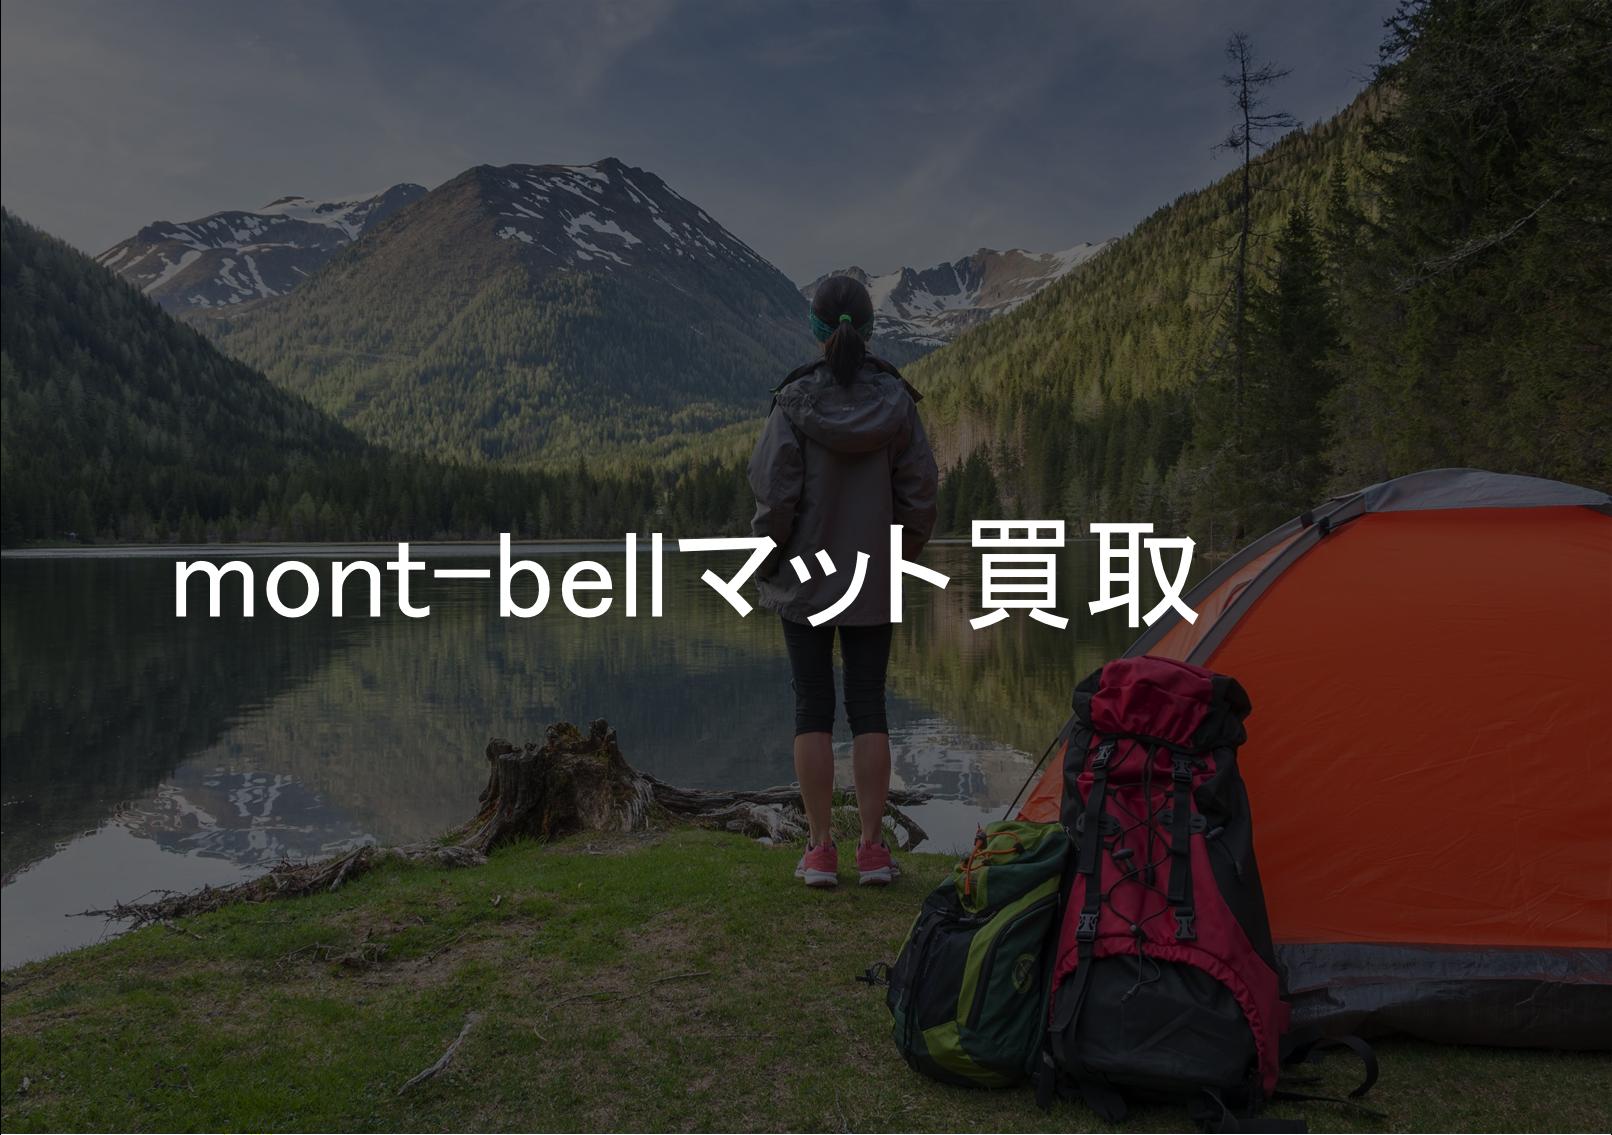 mont-bell スリーピングマット買取なら